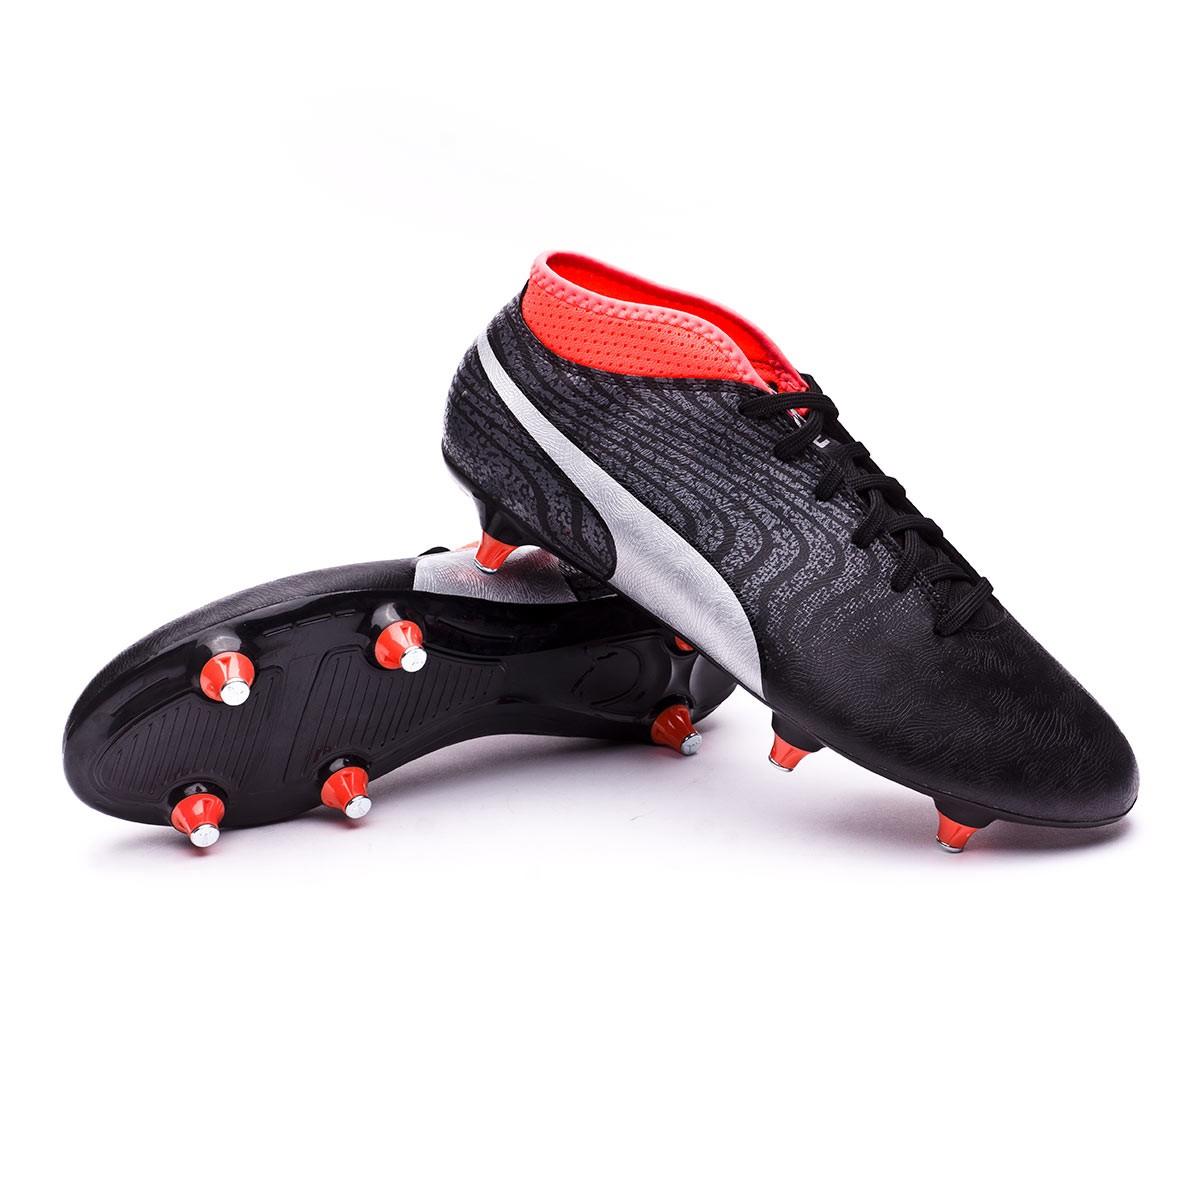 f0fbc18fb15 Football Boots Puma One 18.4 SG Puma Black-Puma Silver-Red Blast ...